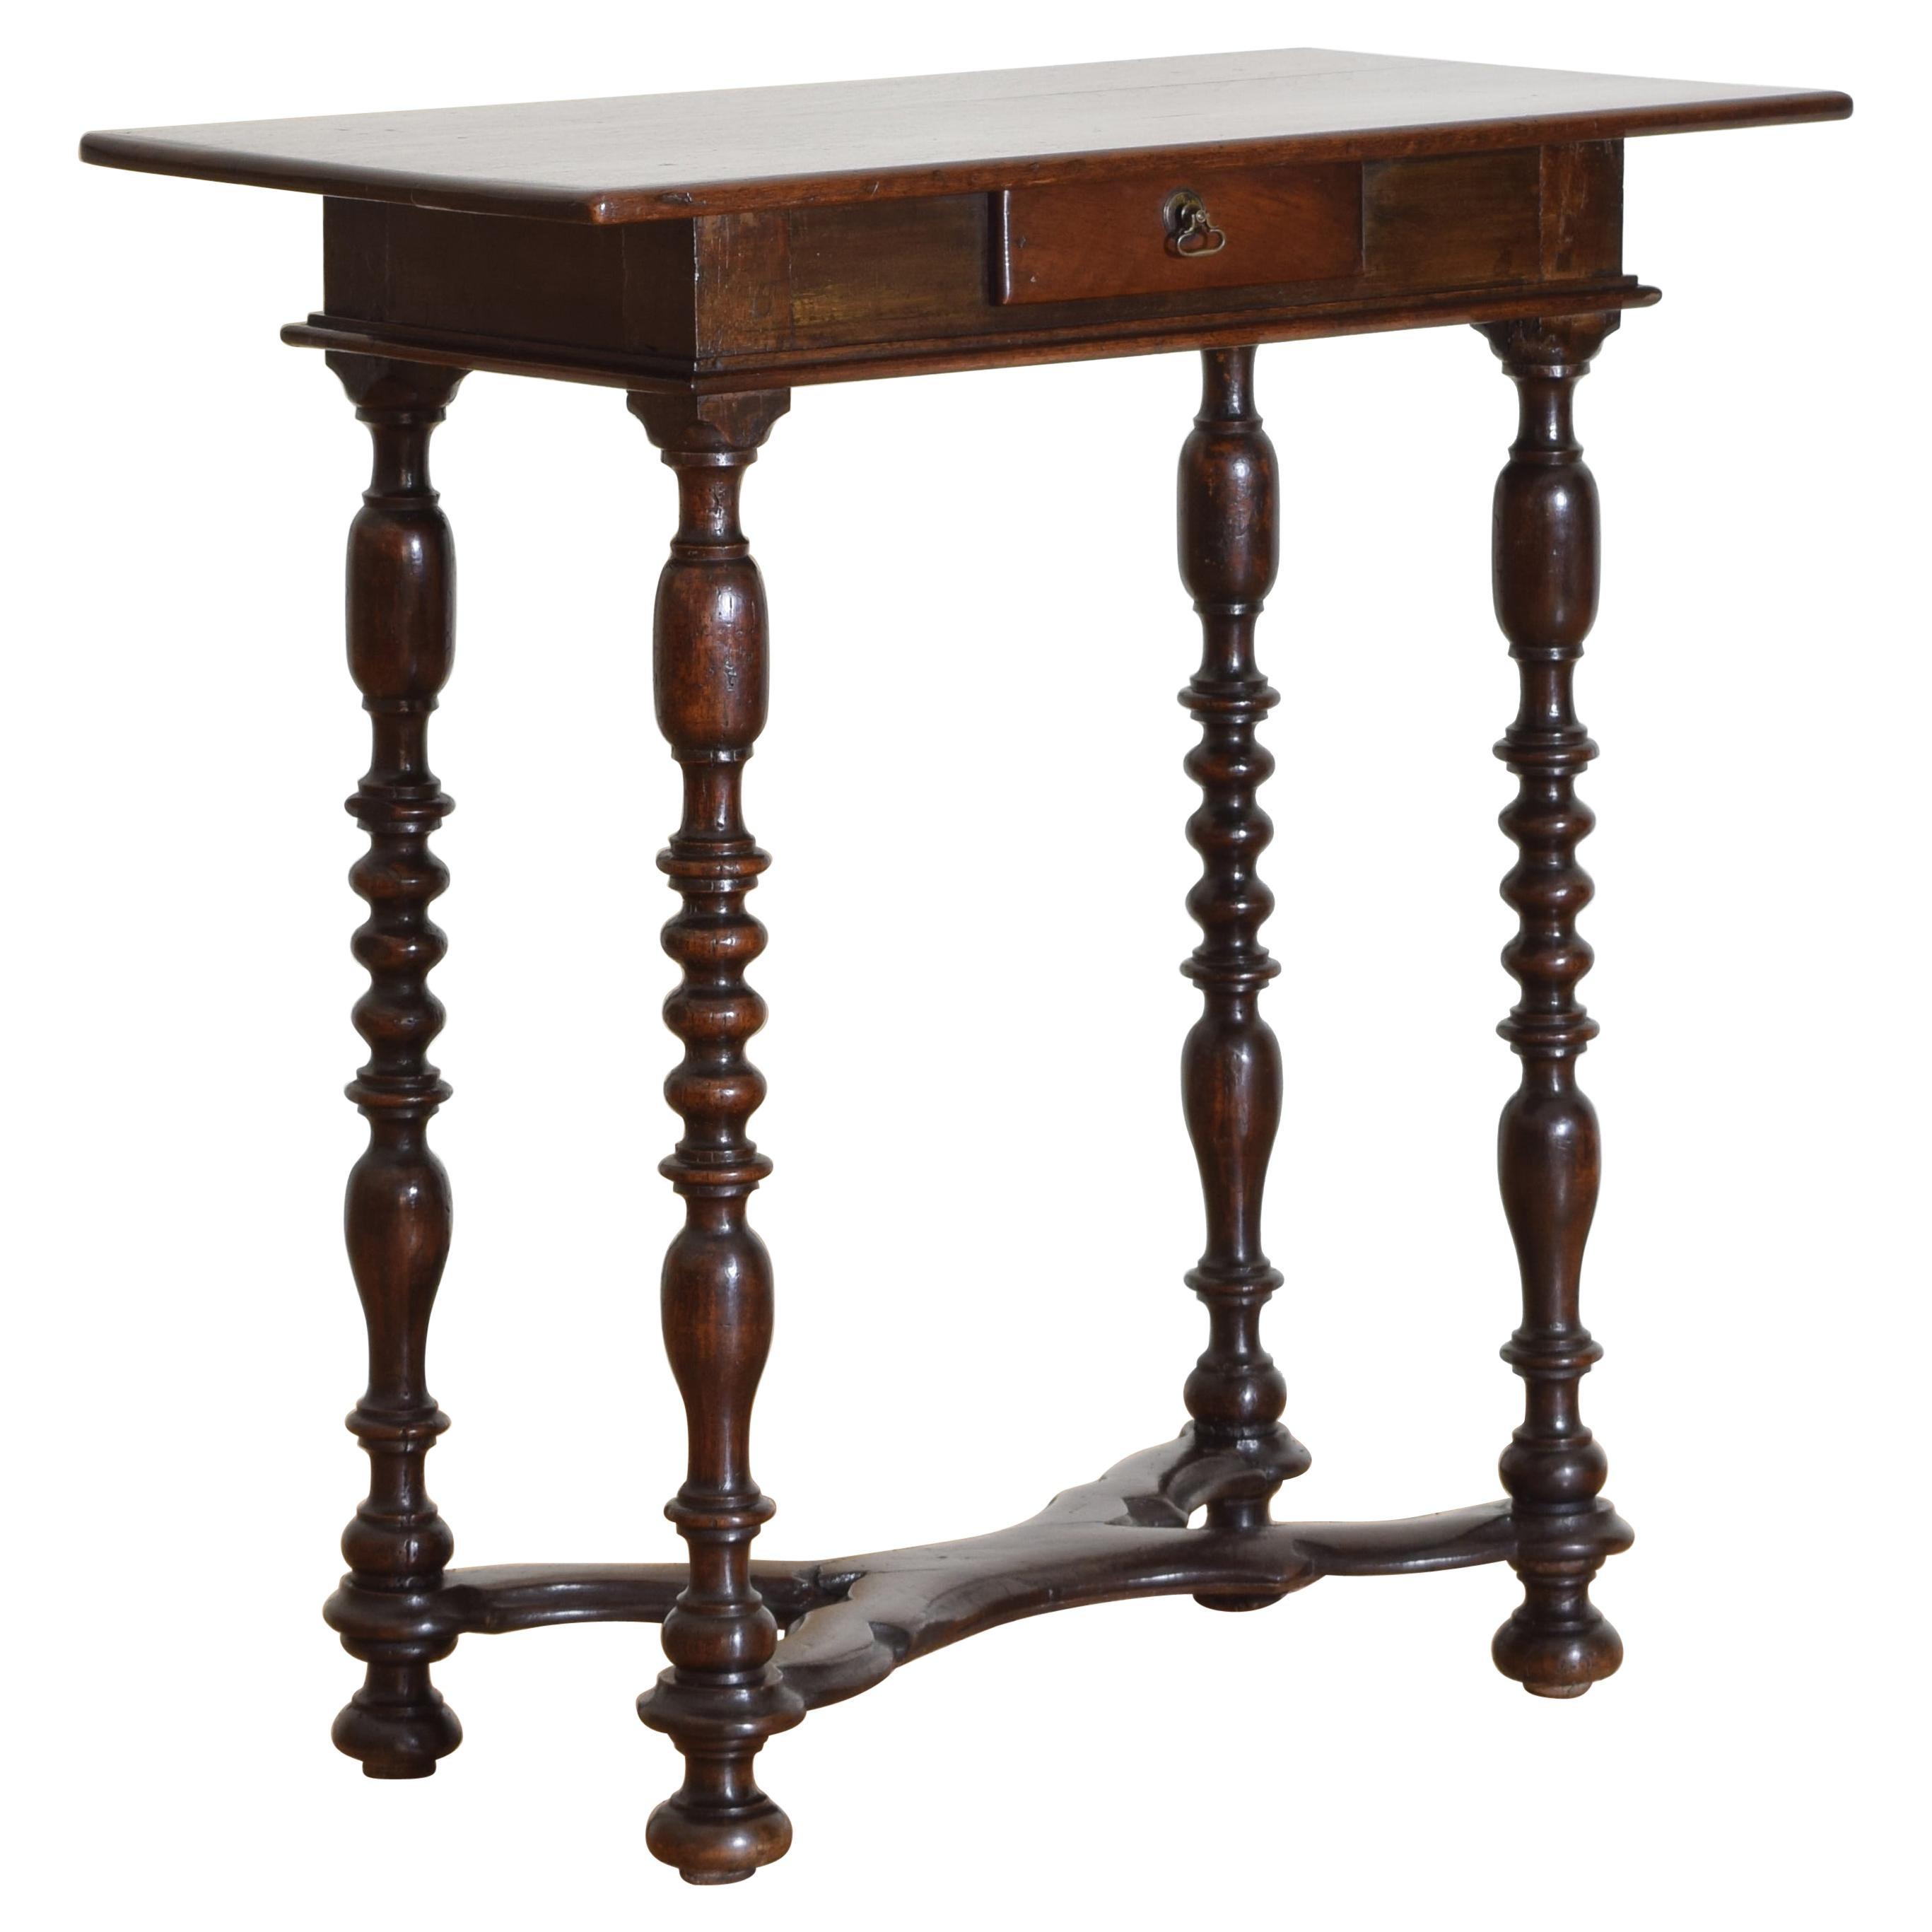 Italian, Emiliana, Turned Walnut 1-Drawer Table, Early 18th Century